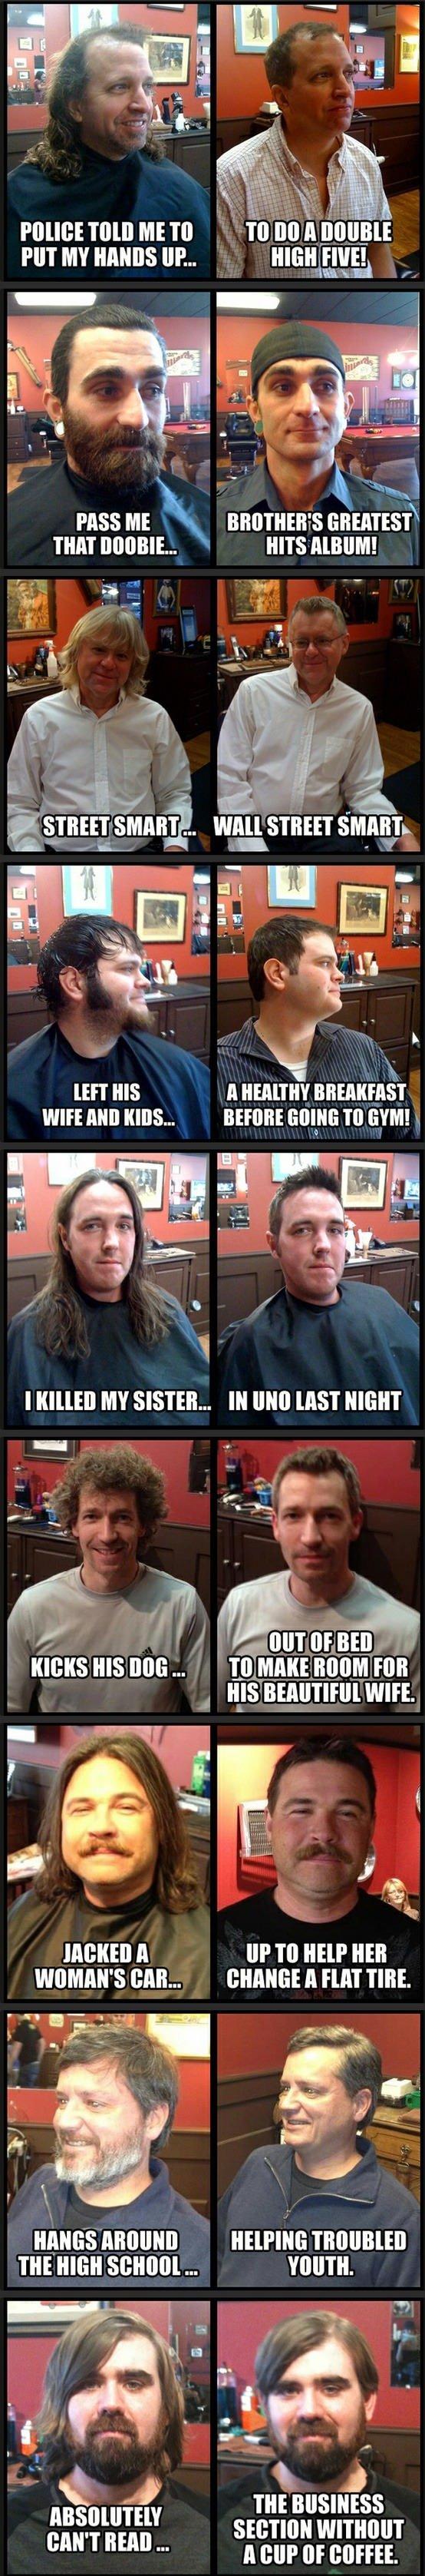 "Your Haircut Matters. . thin. PASS ME ht ""l GIVEA' I' EST\ ET HIS A MAIN? BREAKFAST Mom A  gqq. Has cancer Your Haircut Matters thin PASS ME ht ""l GIVEA' I' EST\ ET HIS A MAIN? BREAKFAST Mom gqq Has cancer"